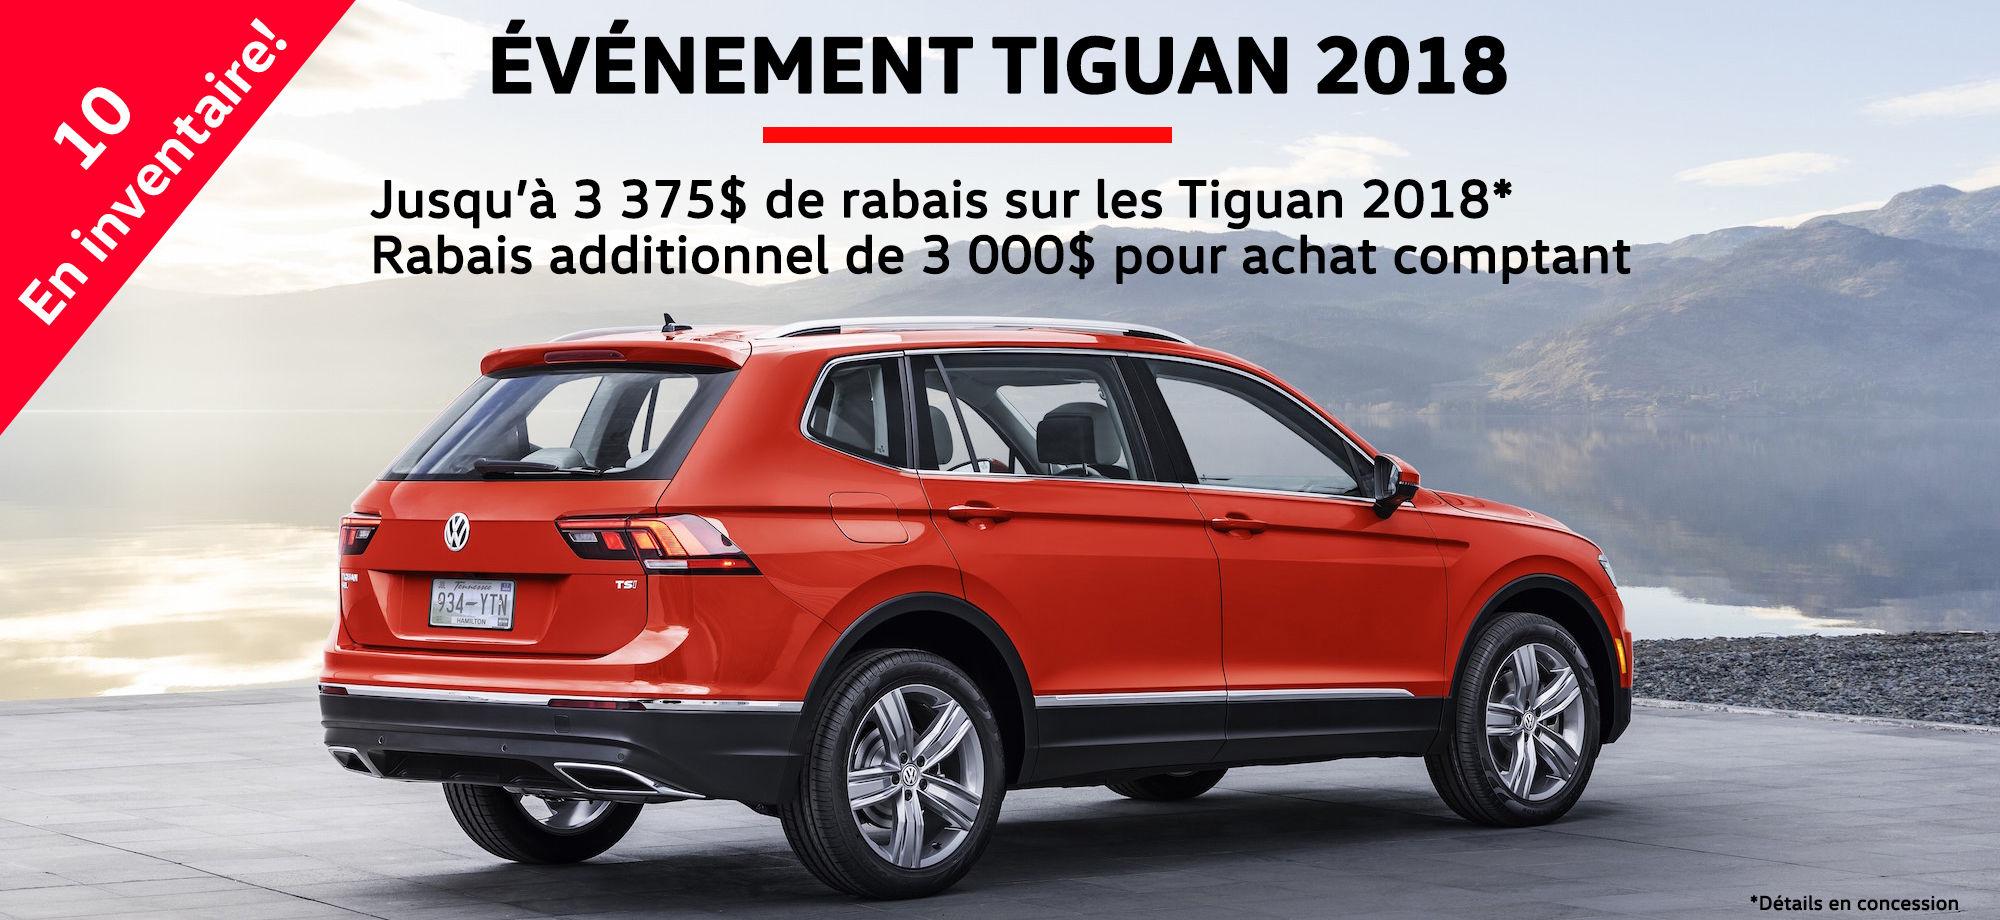 Liquidation Tiguan 2018